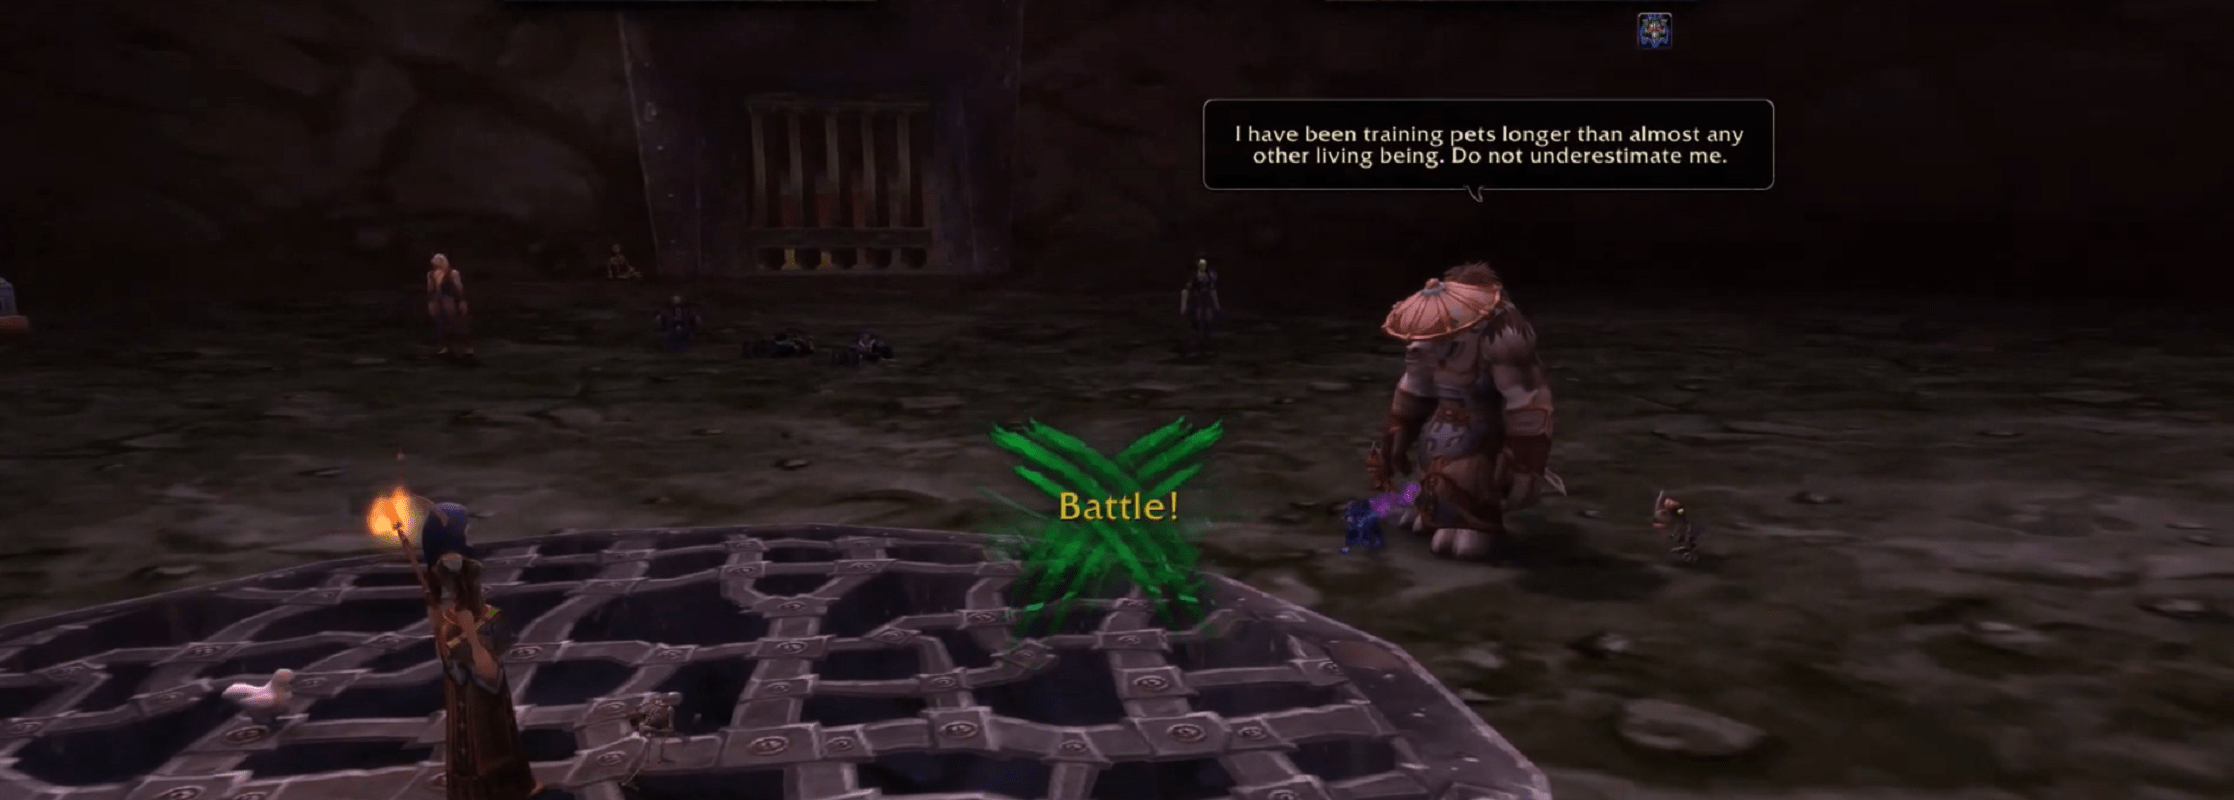 World Of Warcraft: Battle For Azeroth Gets A New Pet Battle Dungeon, Blackrock Depths